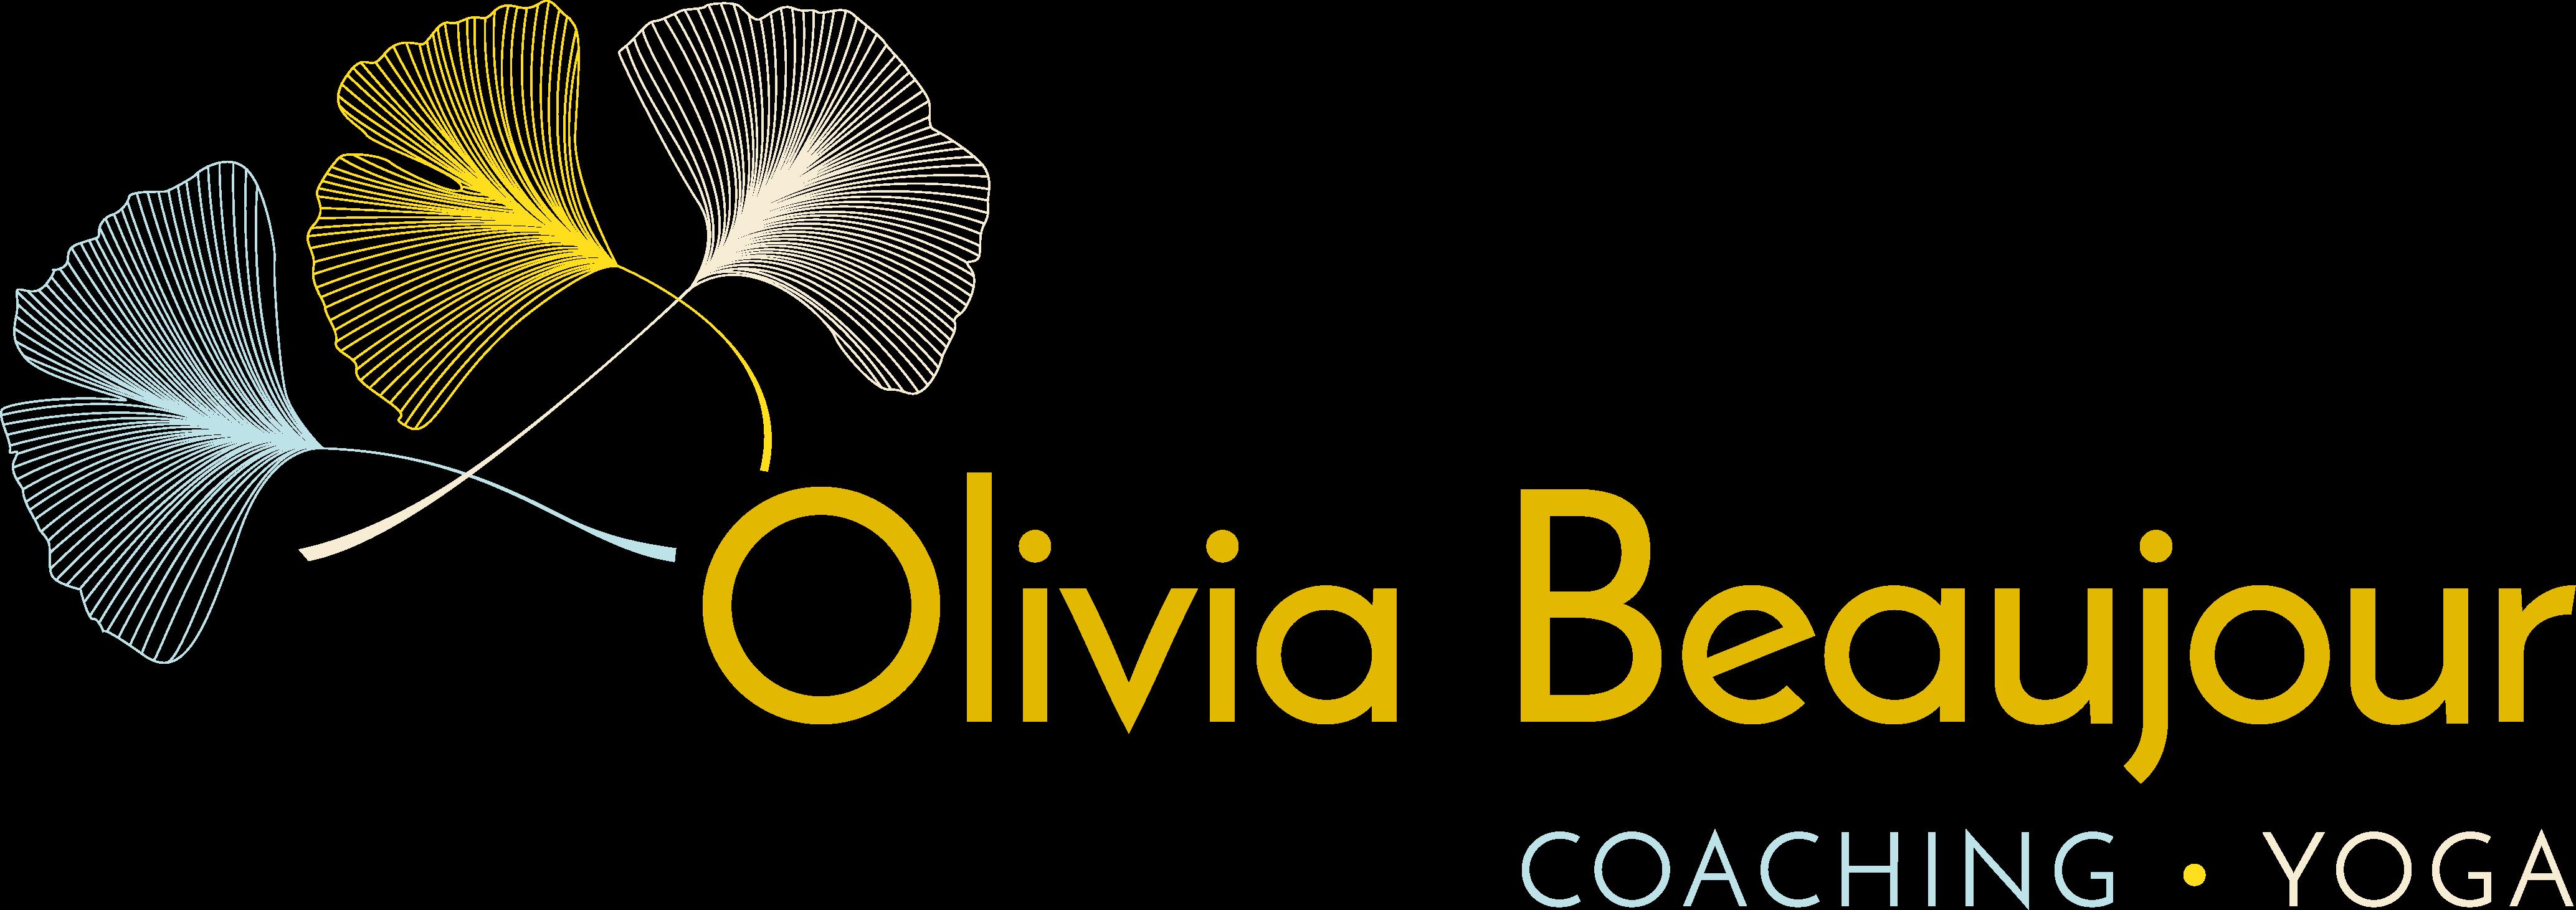 Olivia Beaujour